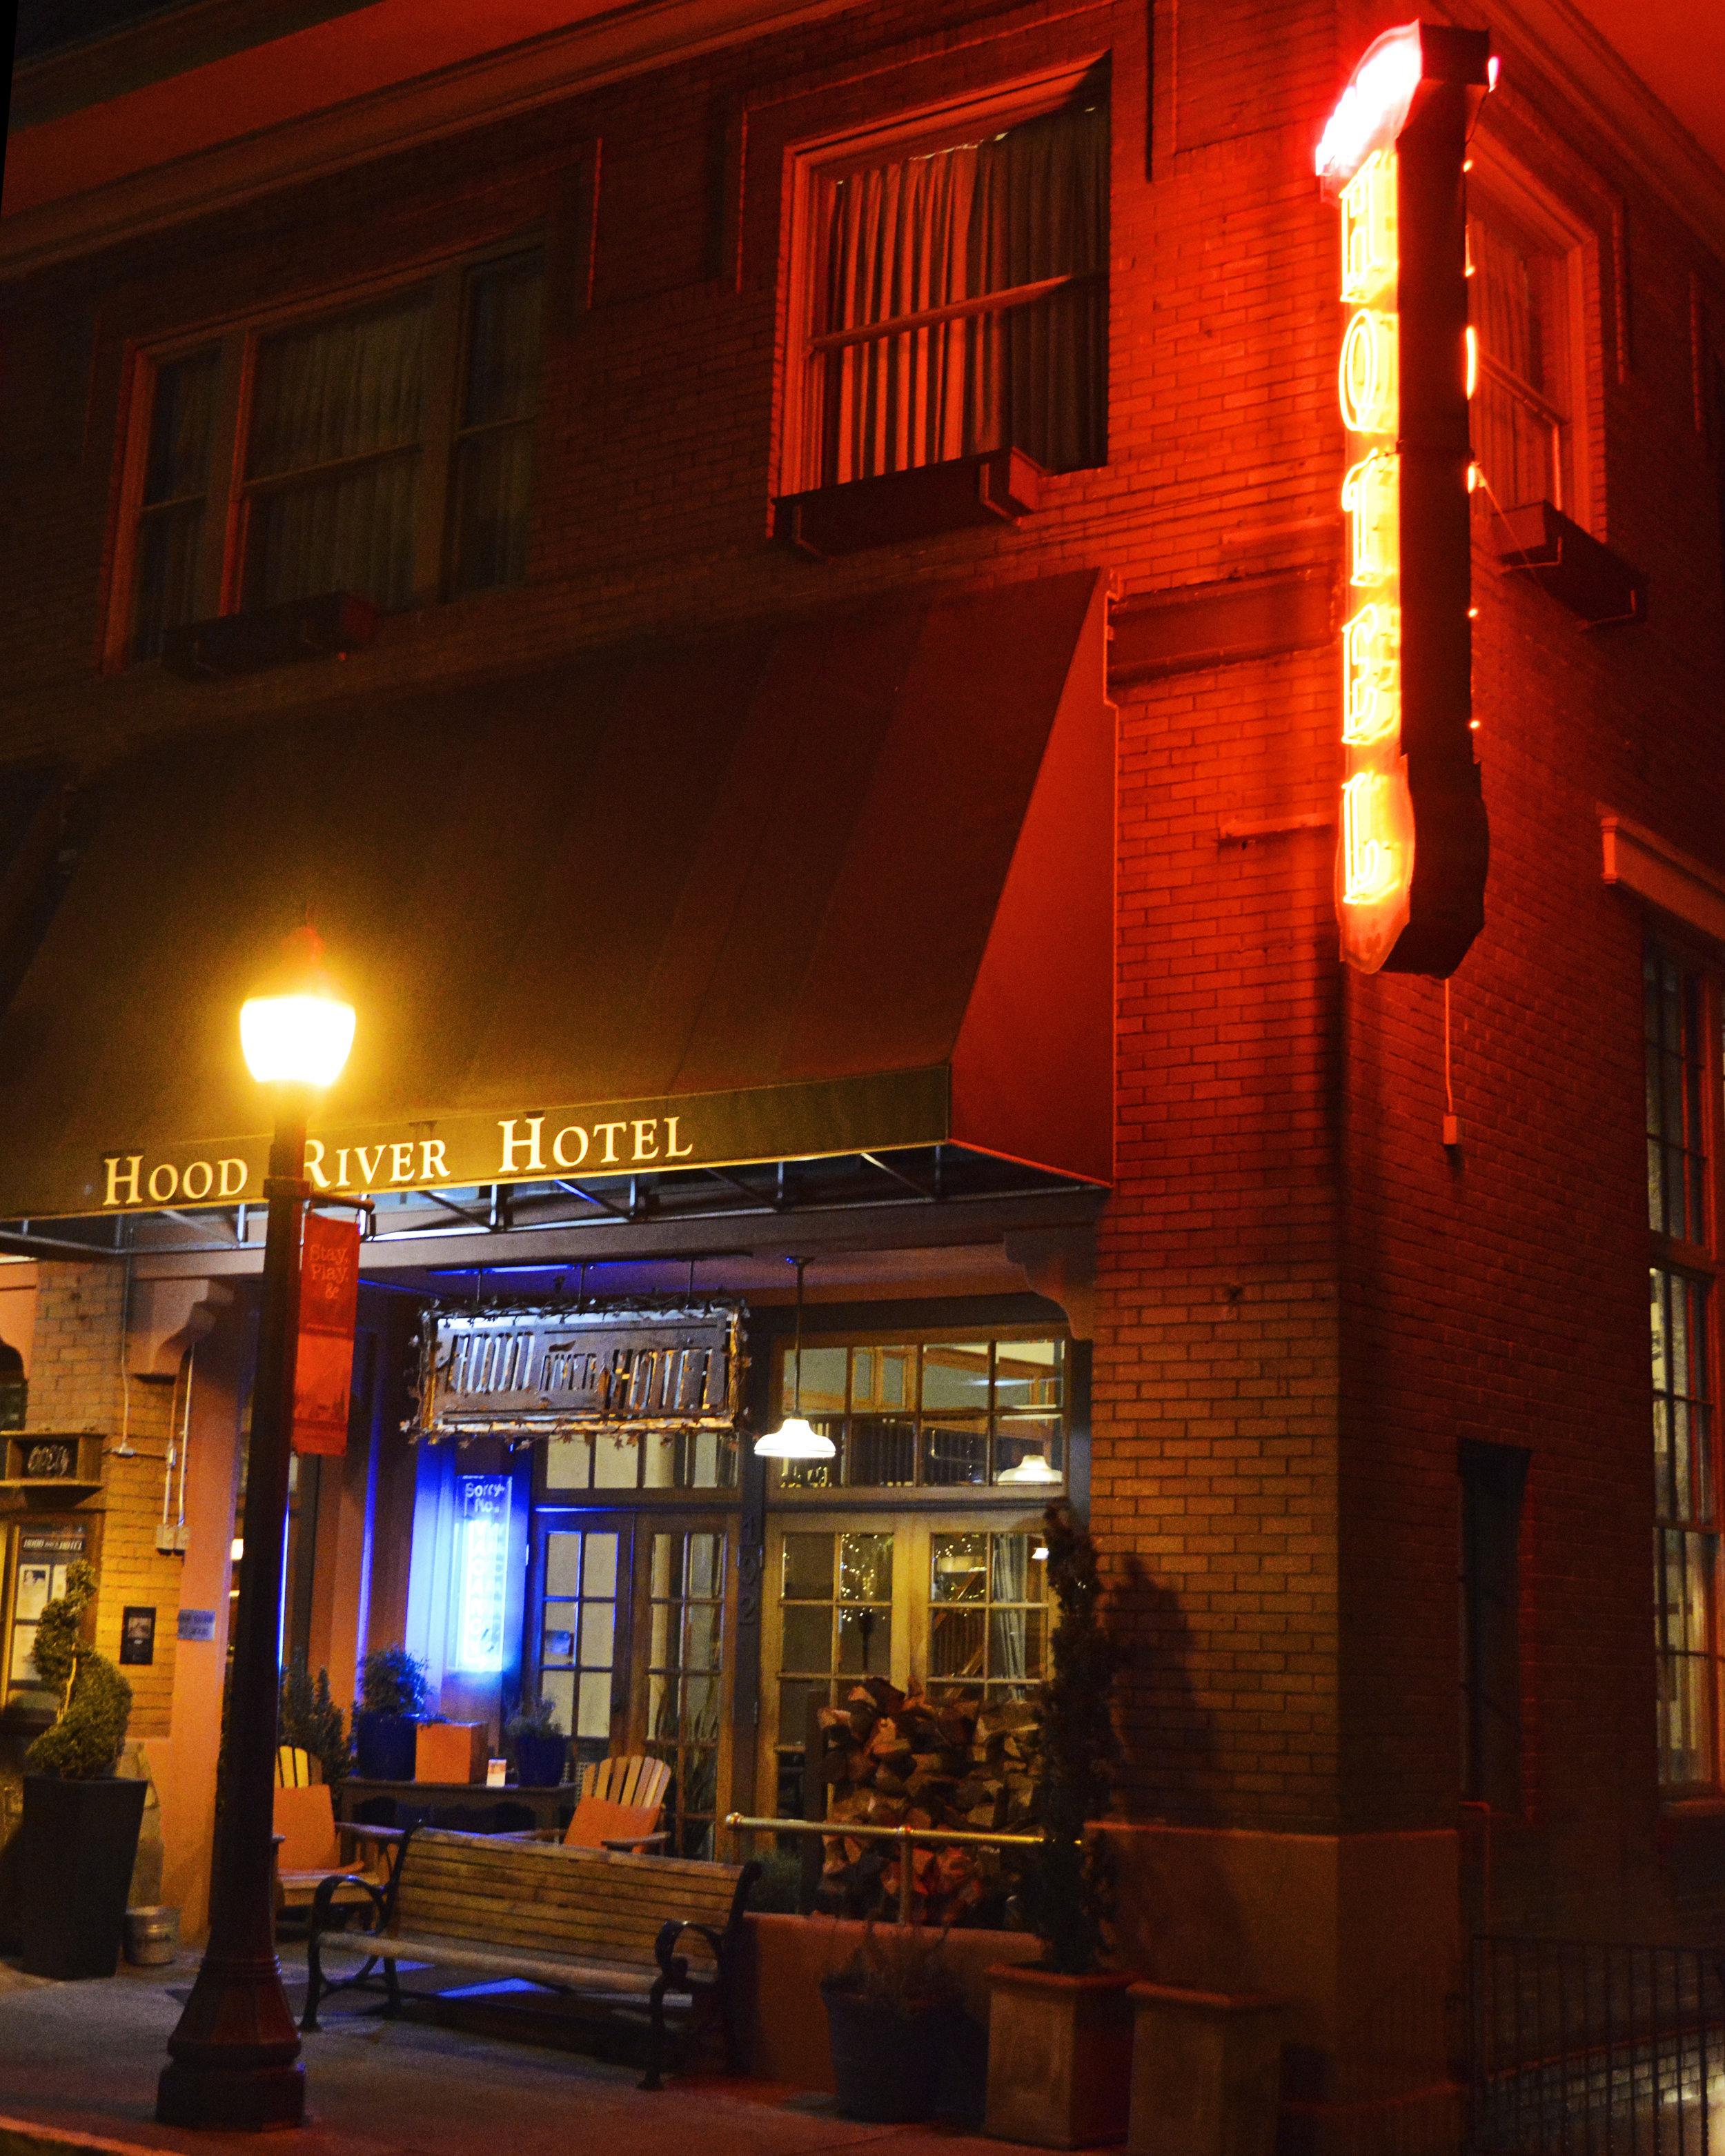 2 Hood-River-Hotel.jpg